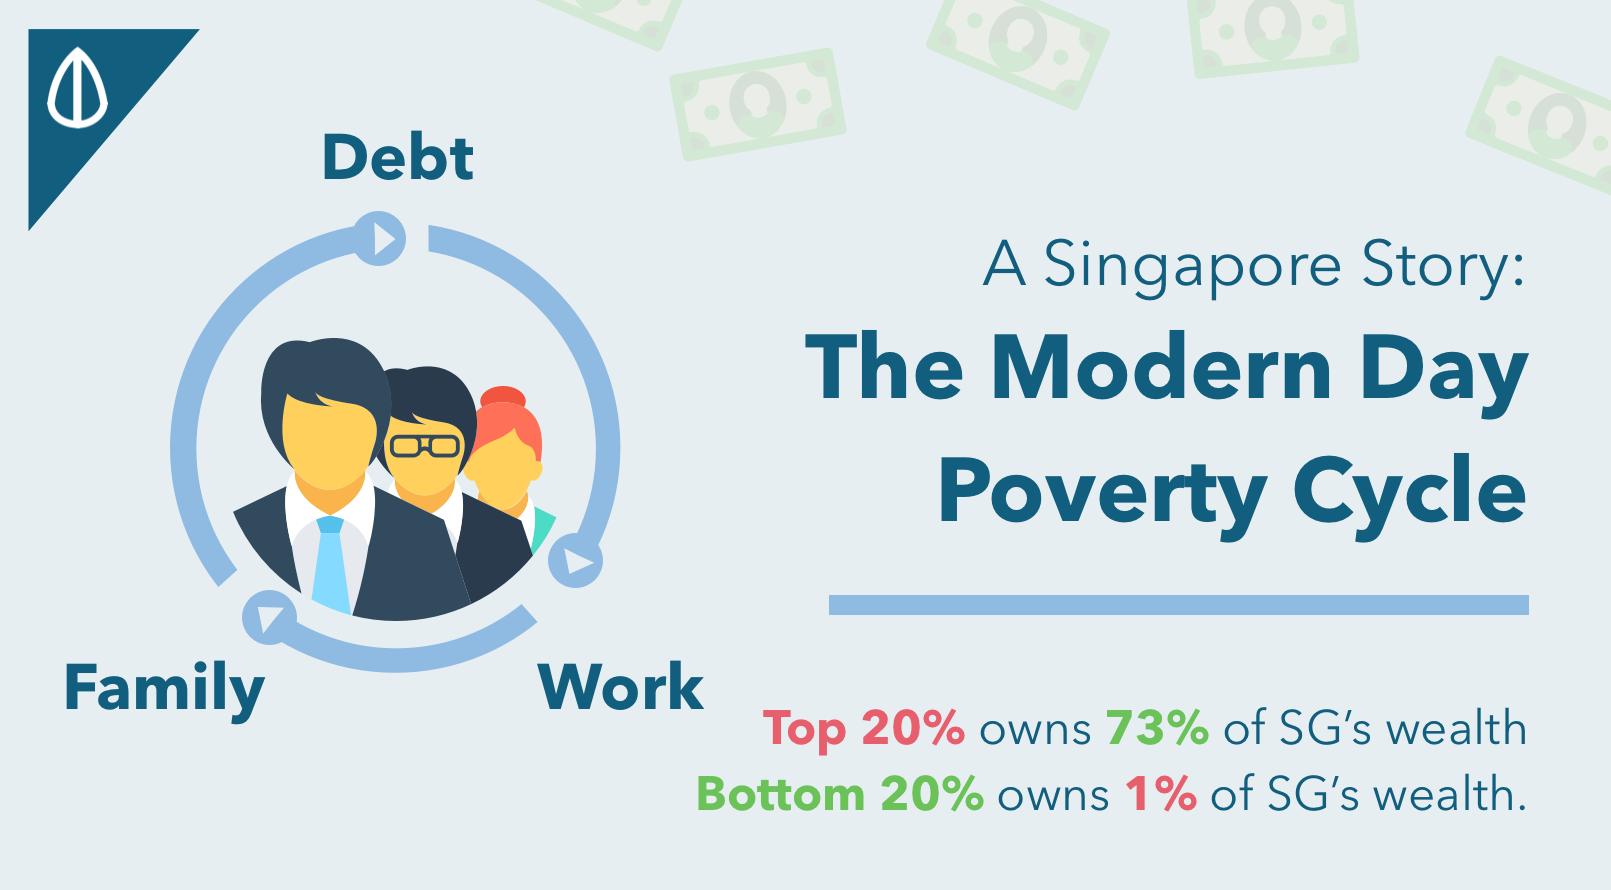 Singapore Modern Day Poverty